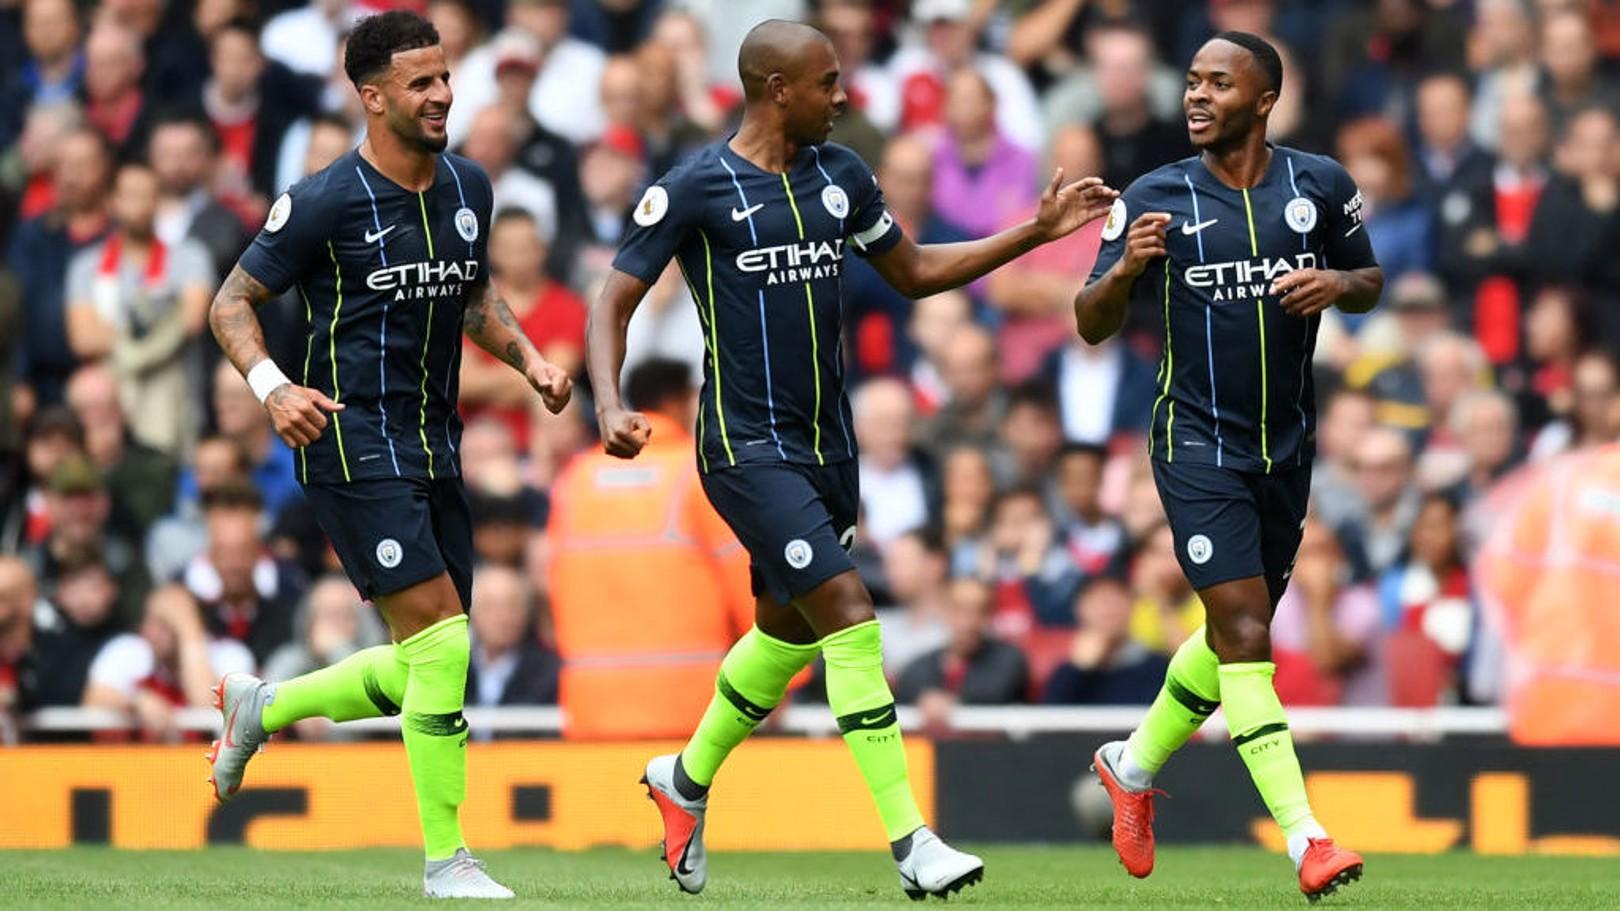 CARDIFF-CITY: Sexta jornada de la Premier League.